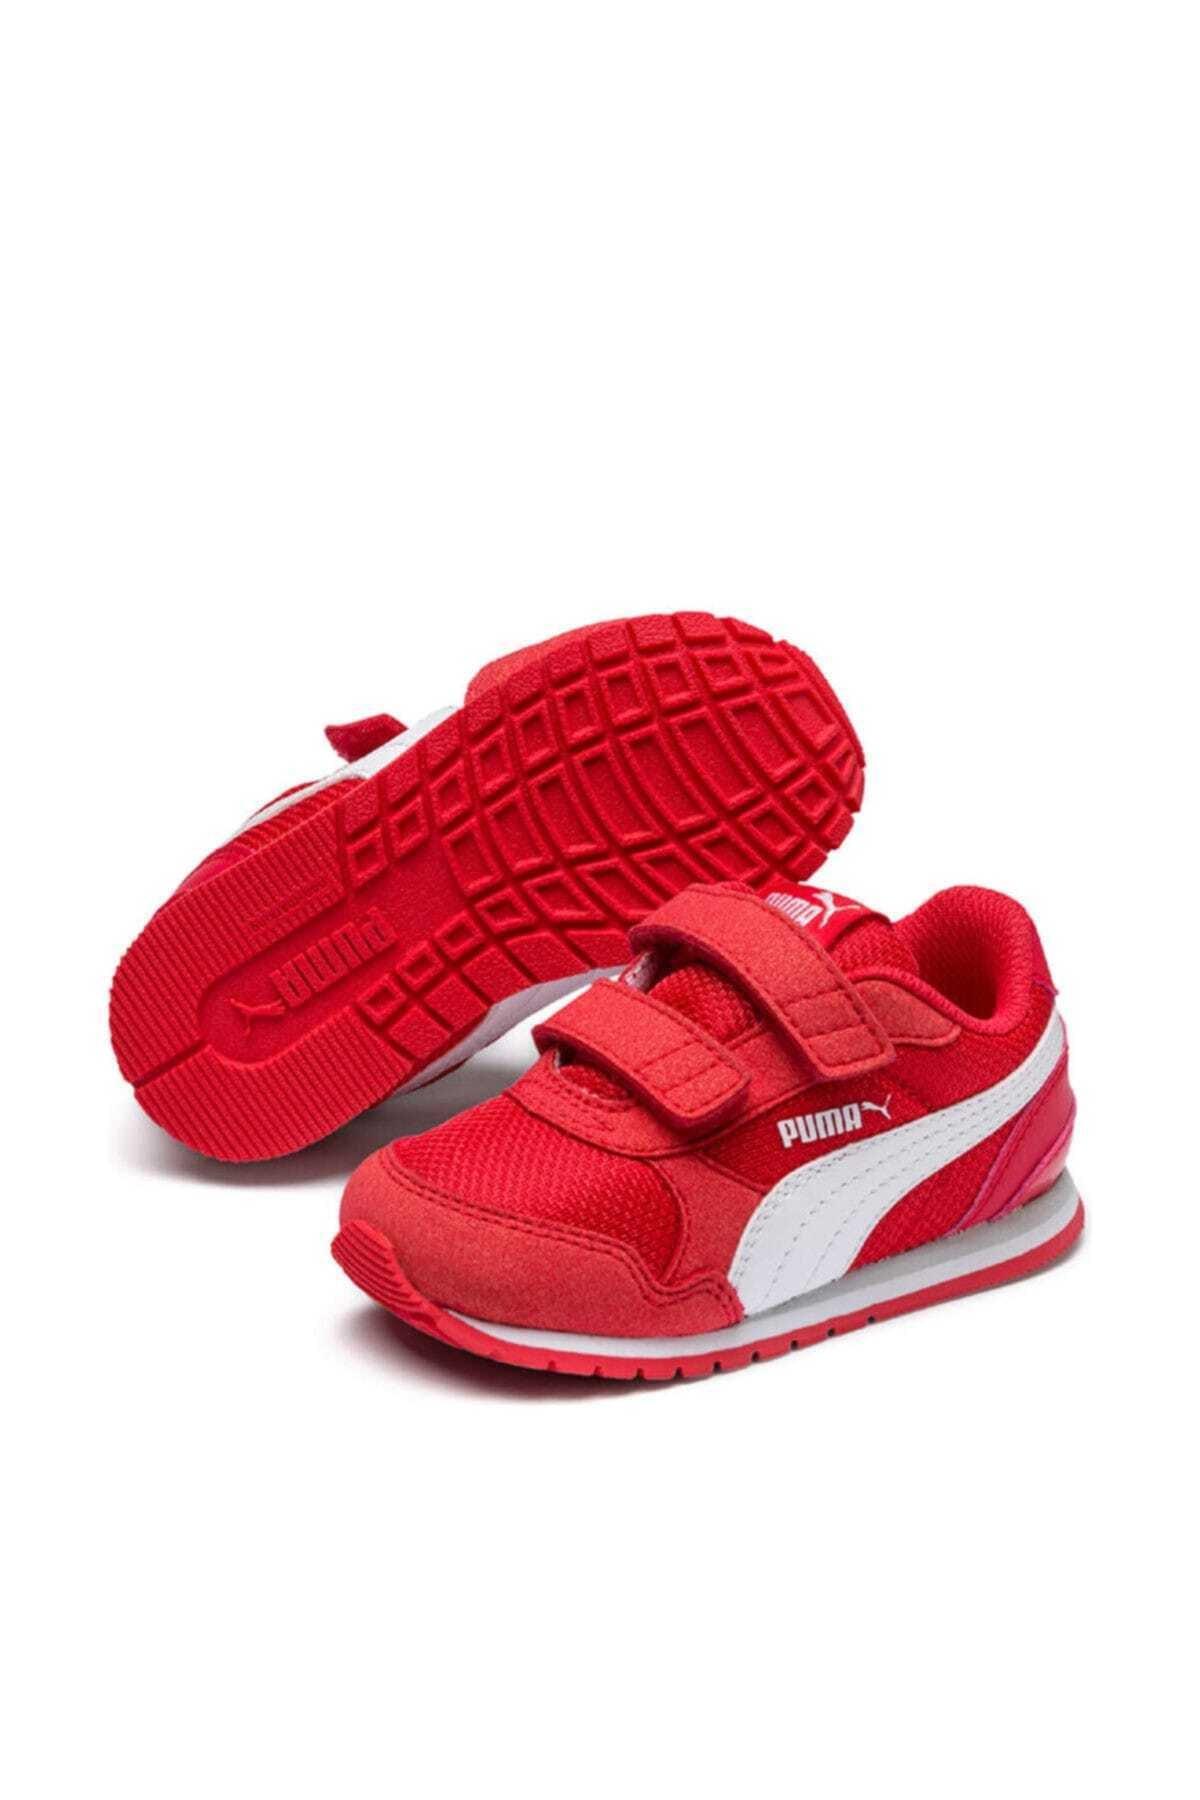 Puma Kids Puma St Runner V2 Mesh V Ps Kırmızı Beyaz Unisex Çocuk Sneaker Ayakkabı 100415121 1